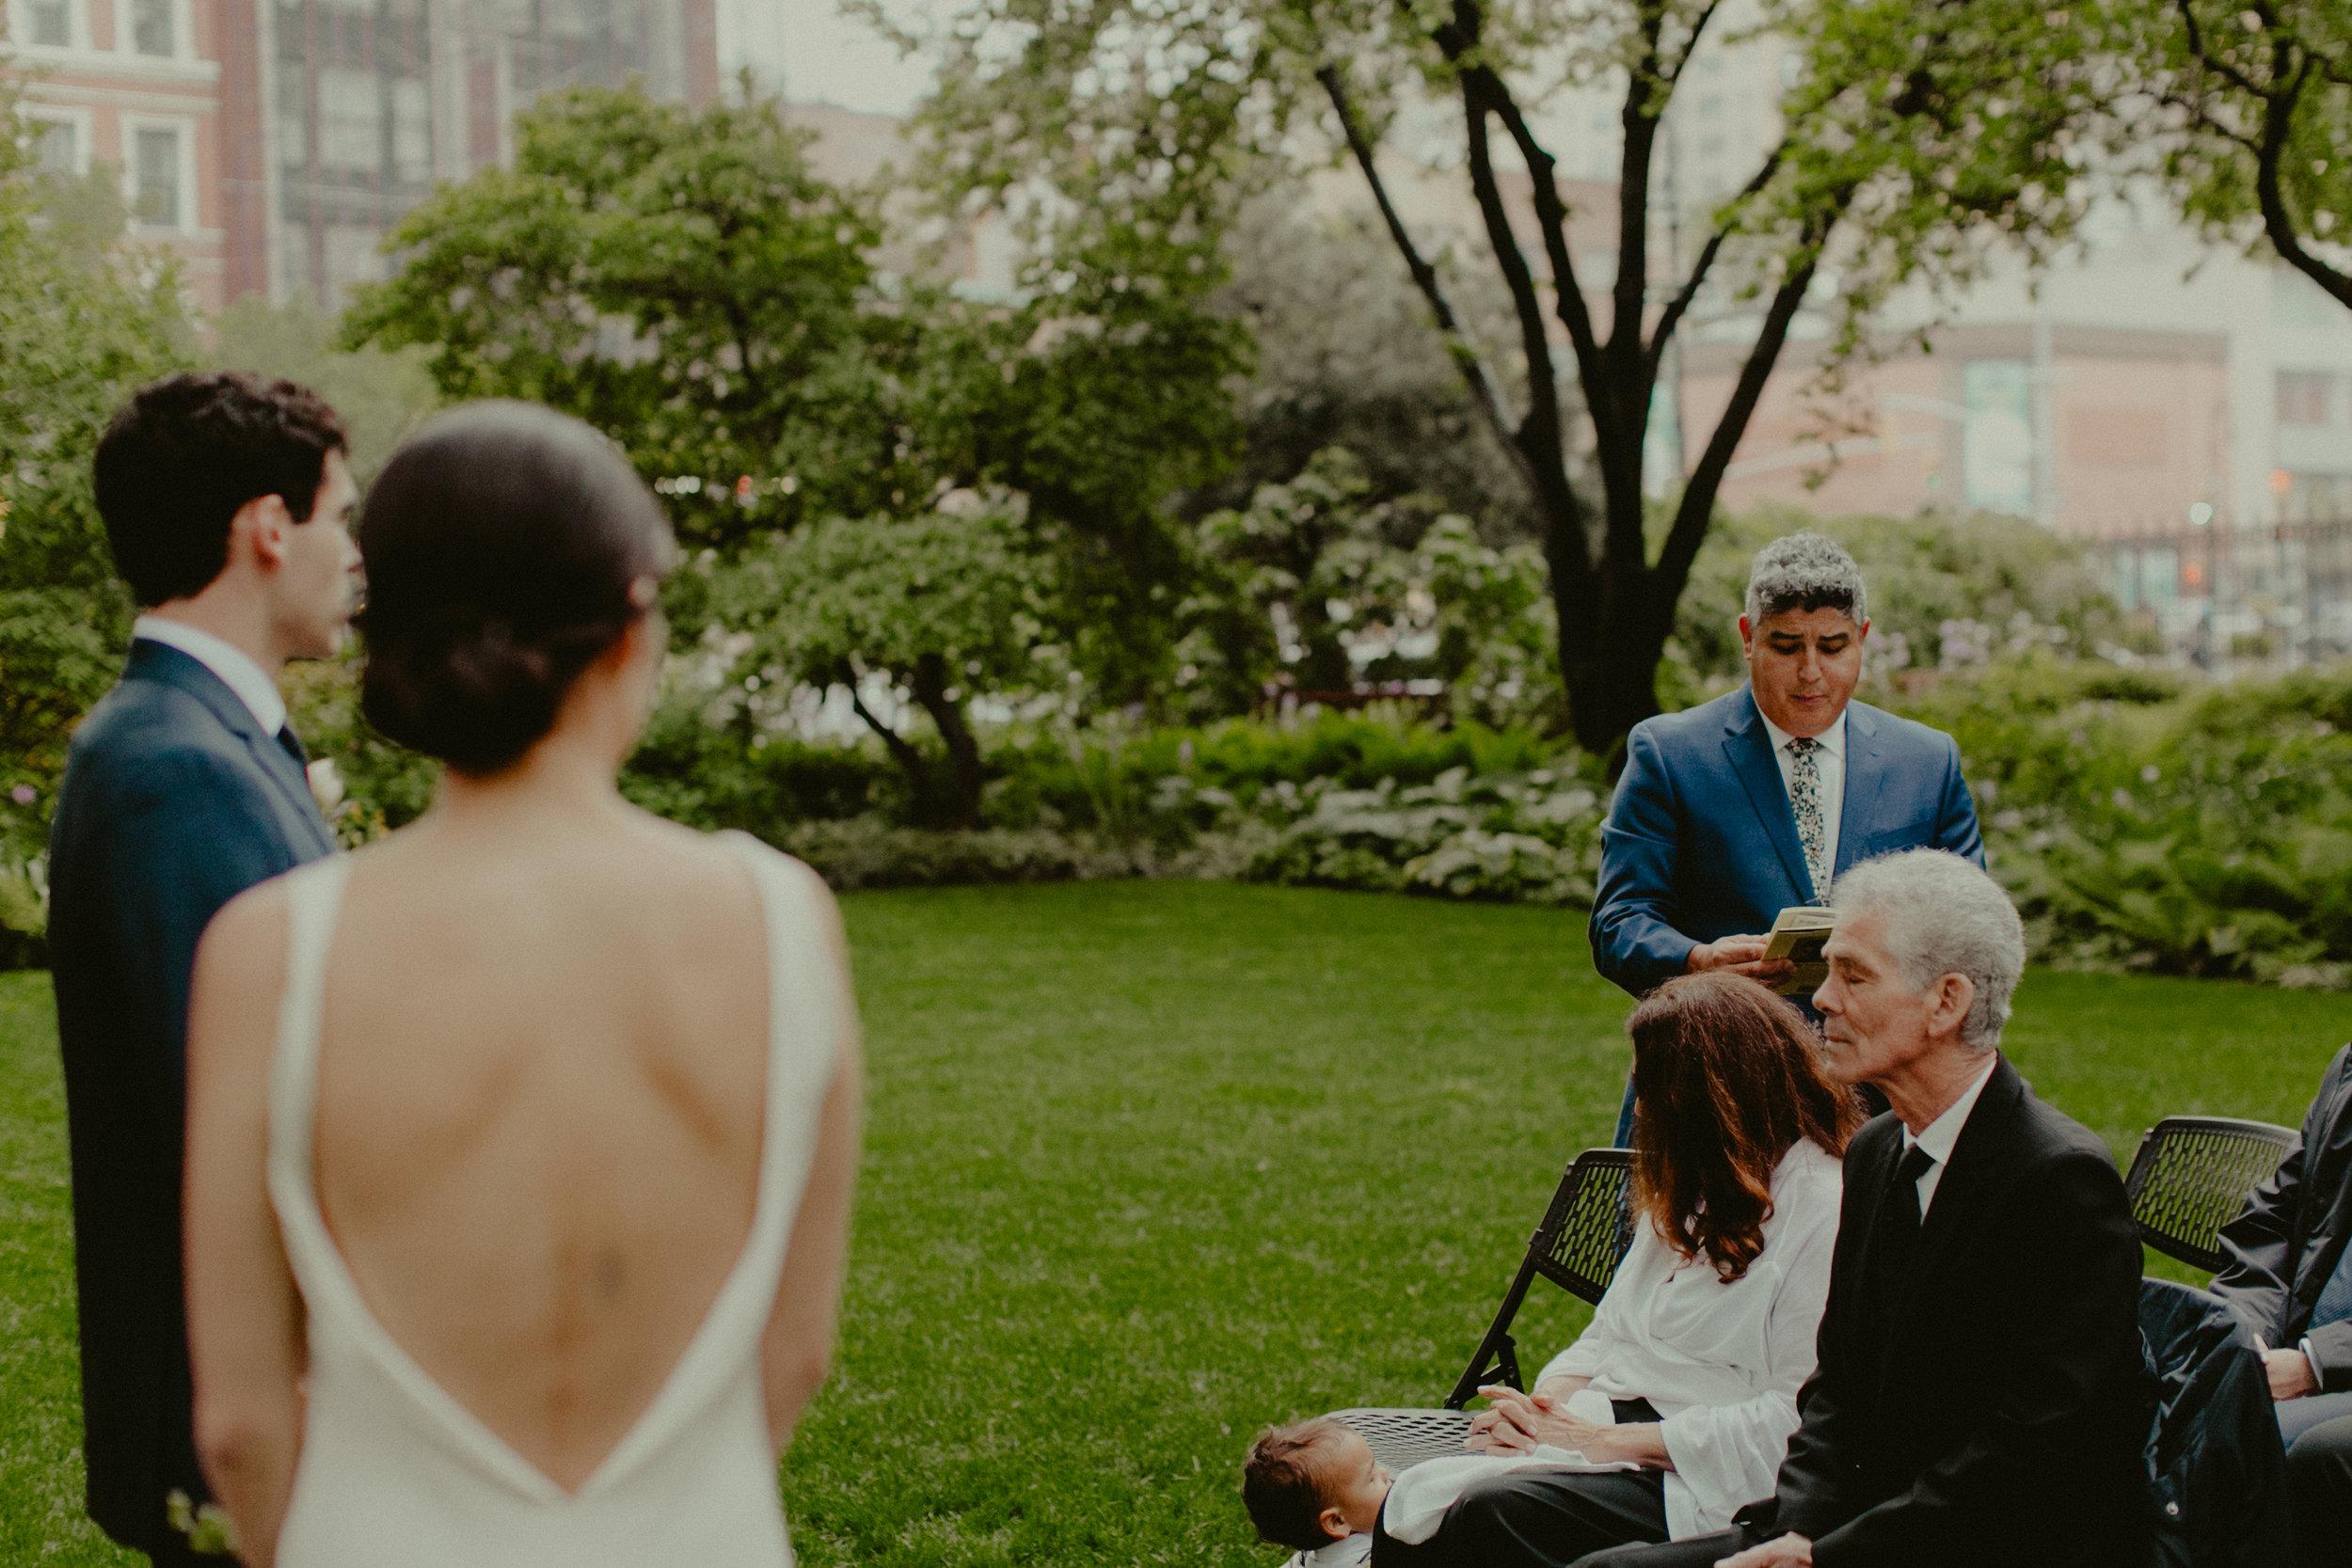 beekman hotel 461jefferson garden market wedding.JPG